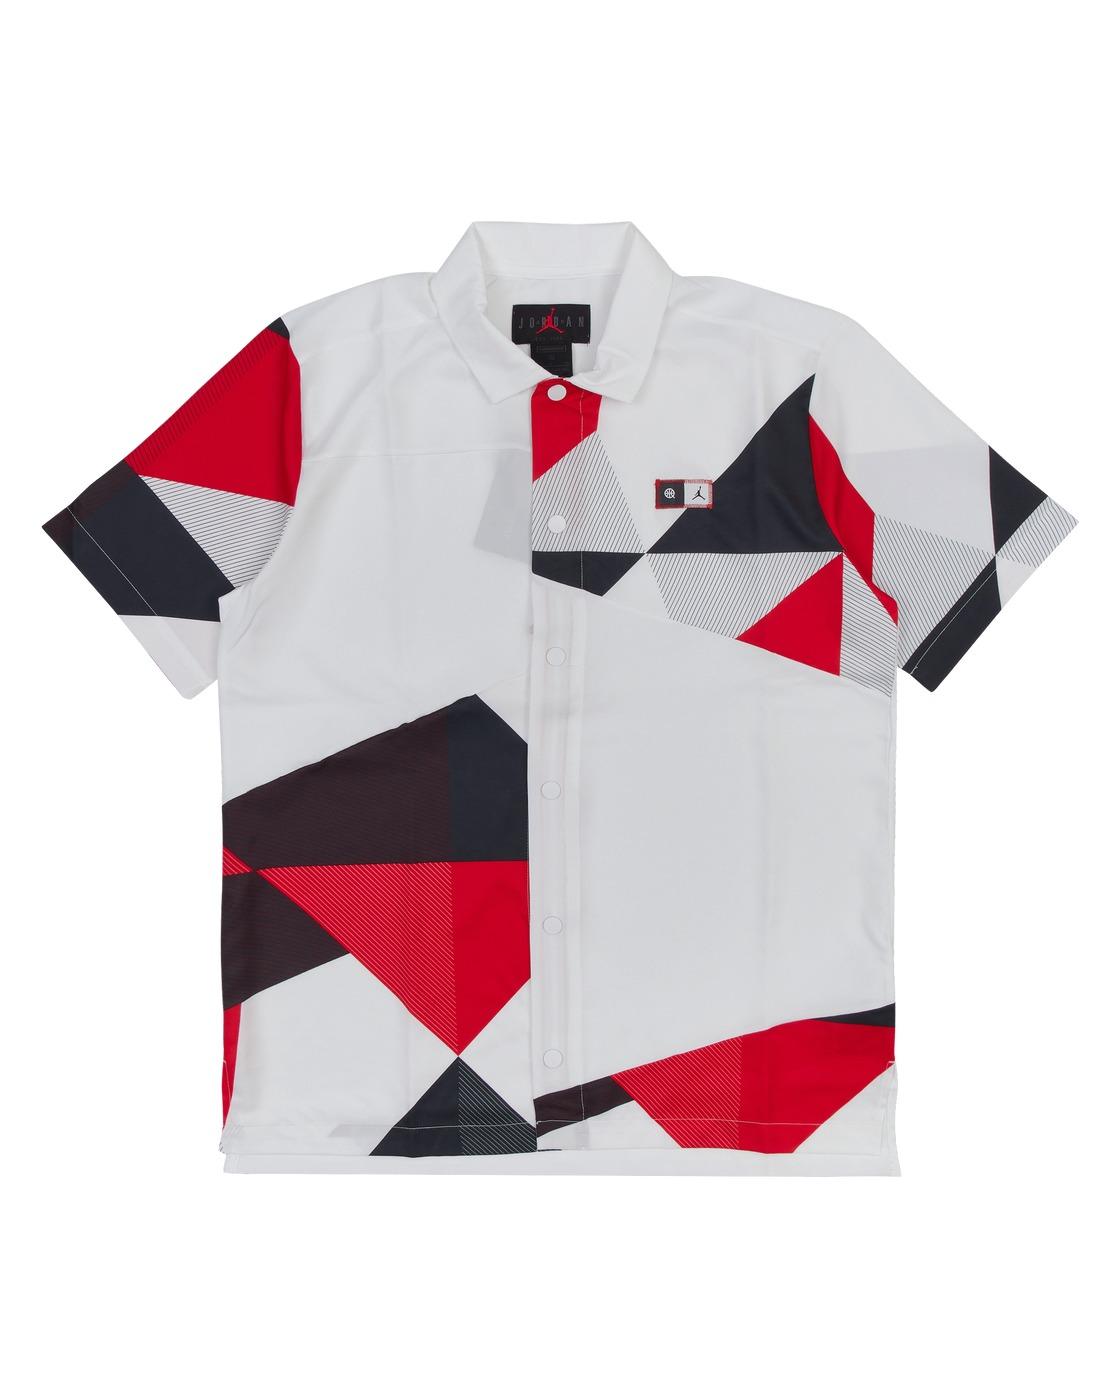 Photo: Nike Jordan Quai 54 Shooting Shirt White